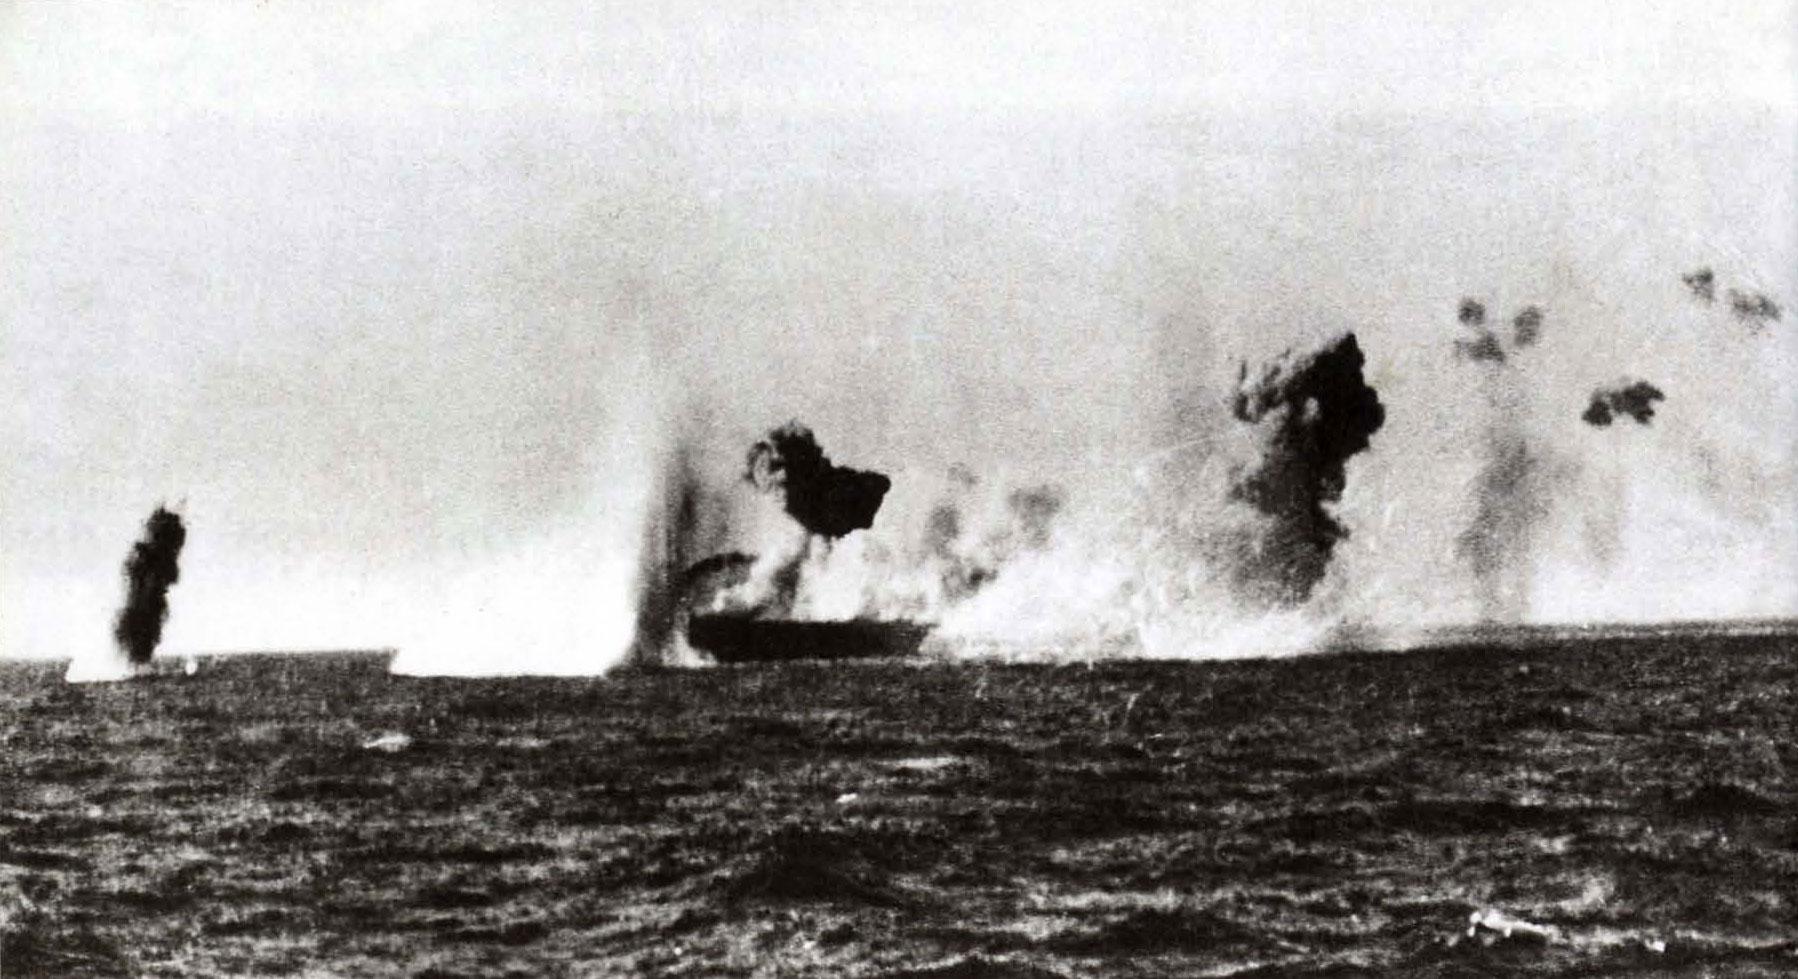 Naval-targets-hit-by-Stukas-attacking-HMS-Illustrious-160km-from-Malta-1941-01.jpg